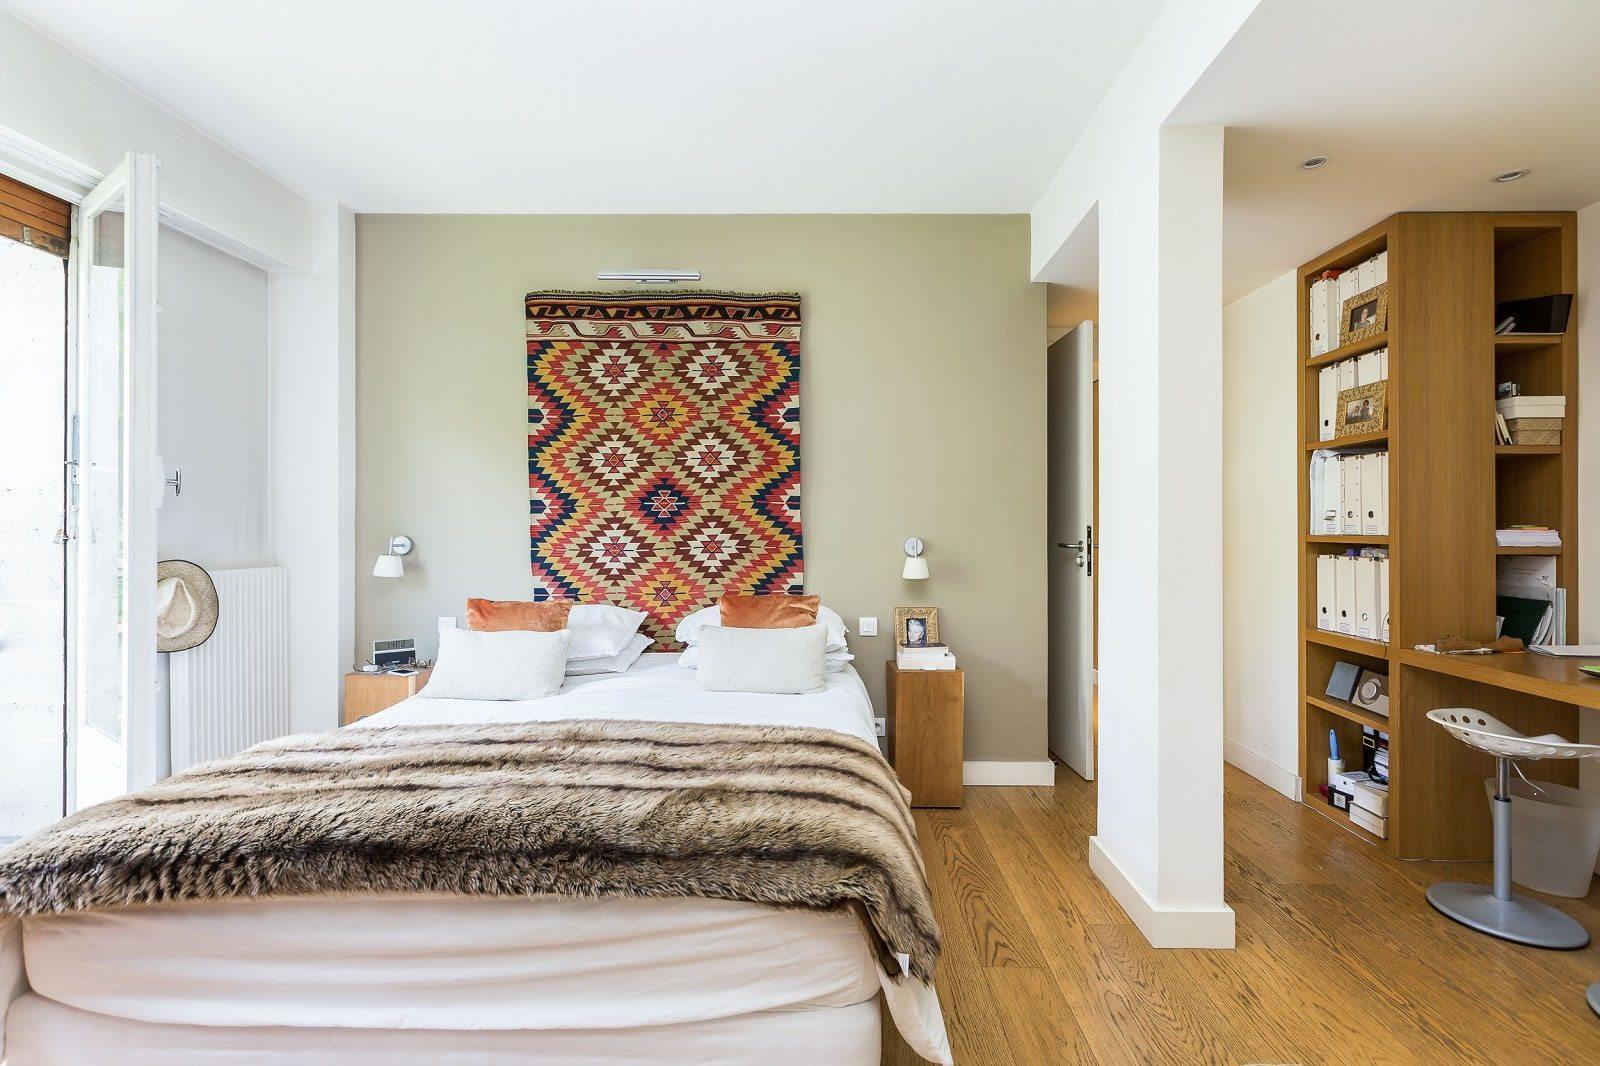 Appartement A Vendre Lyon Monplaisir